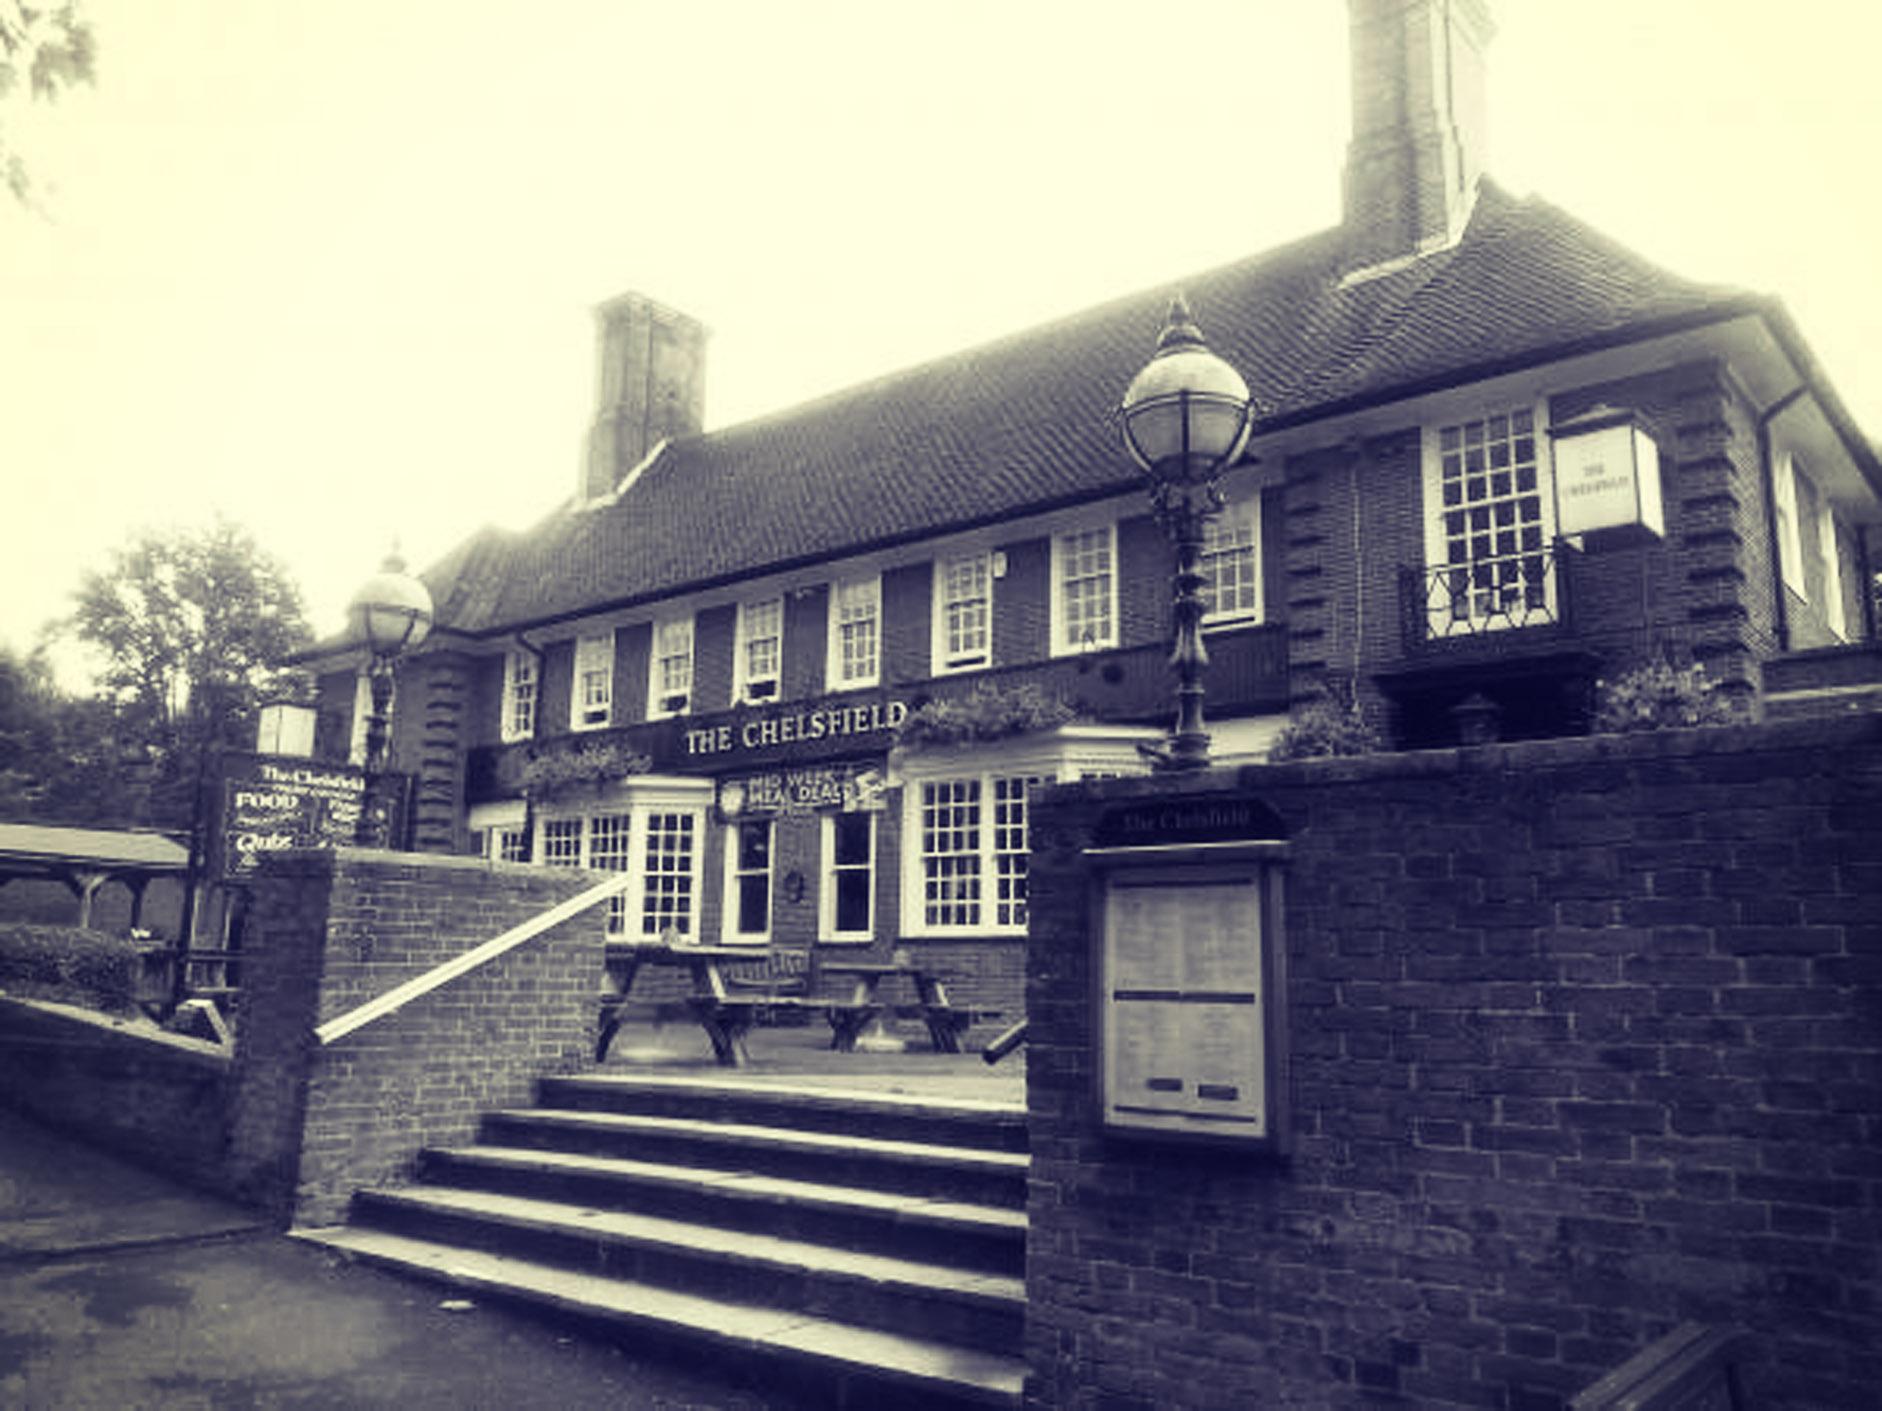 the chelsfield pub orpington